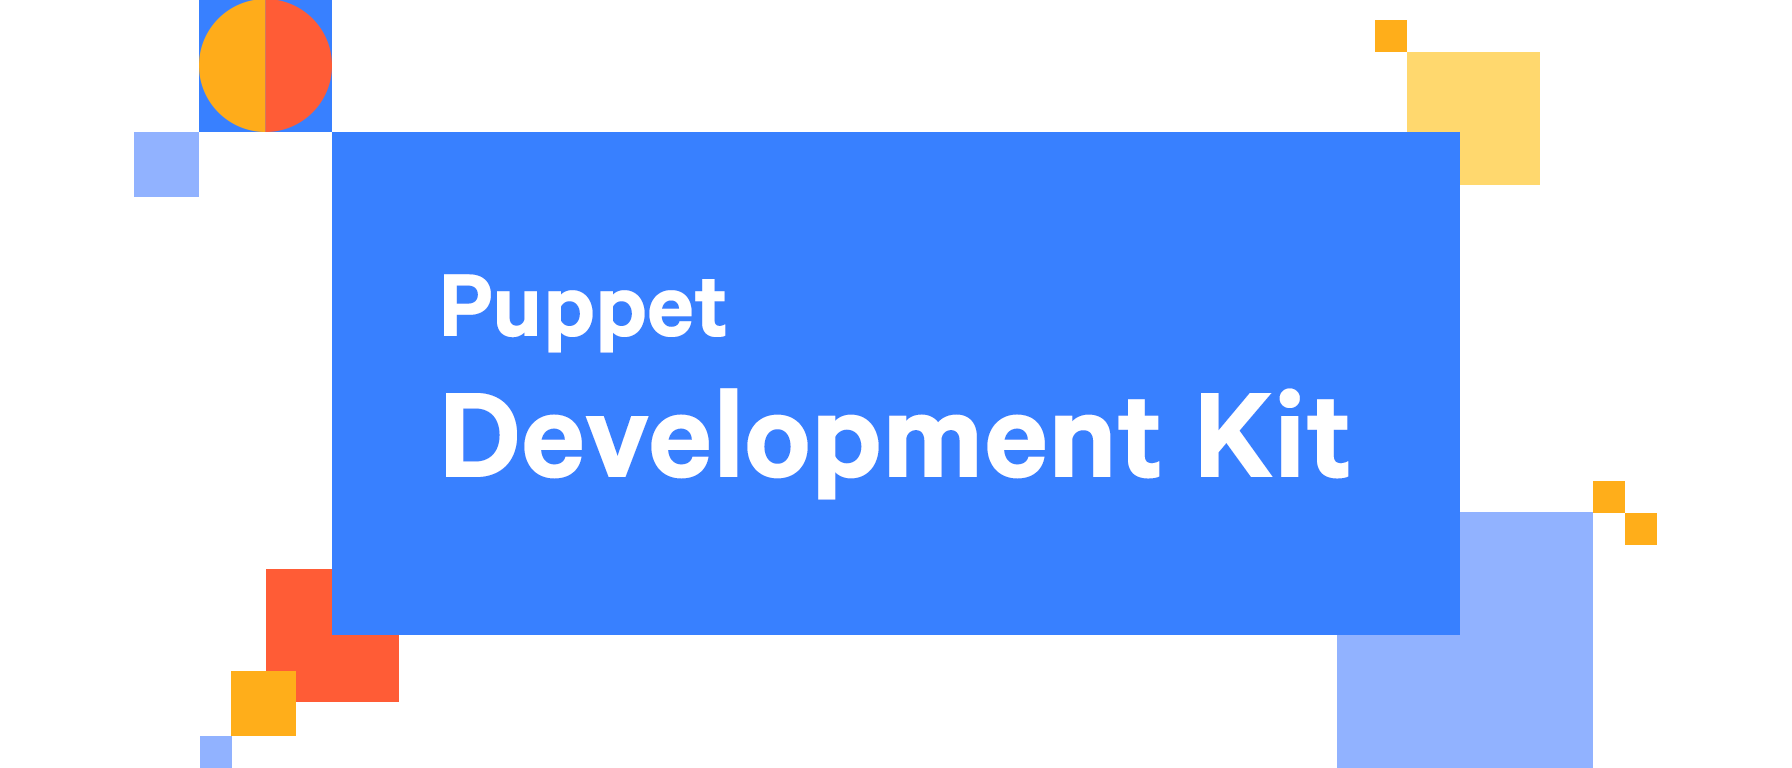 Try PuppetDevelopmentKit